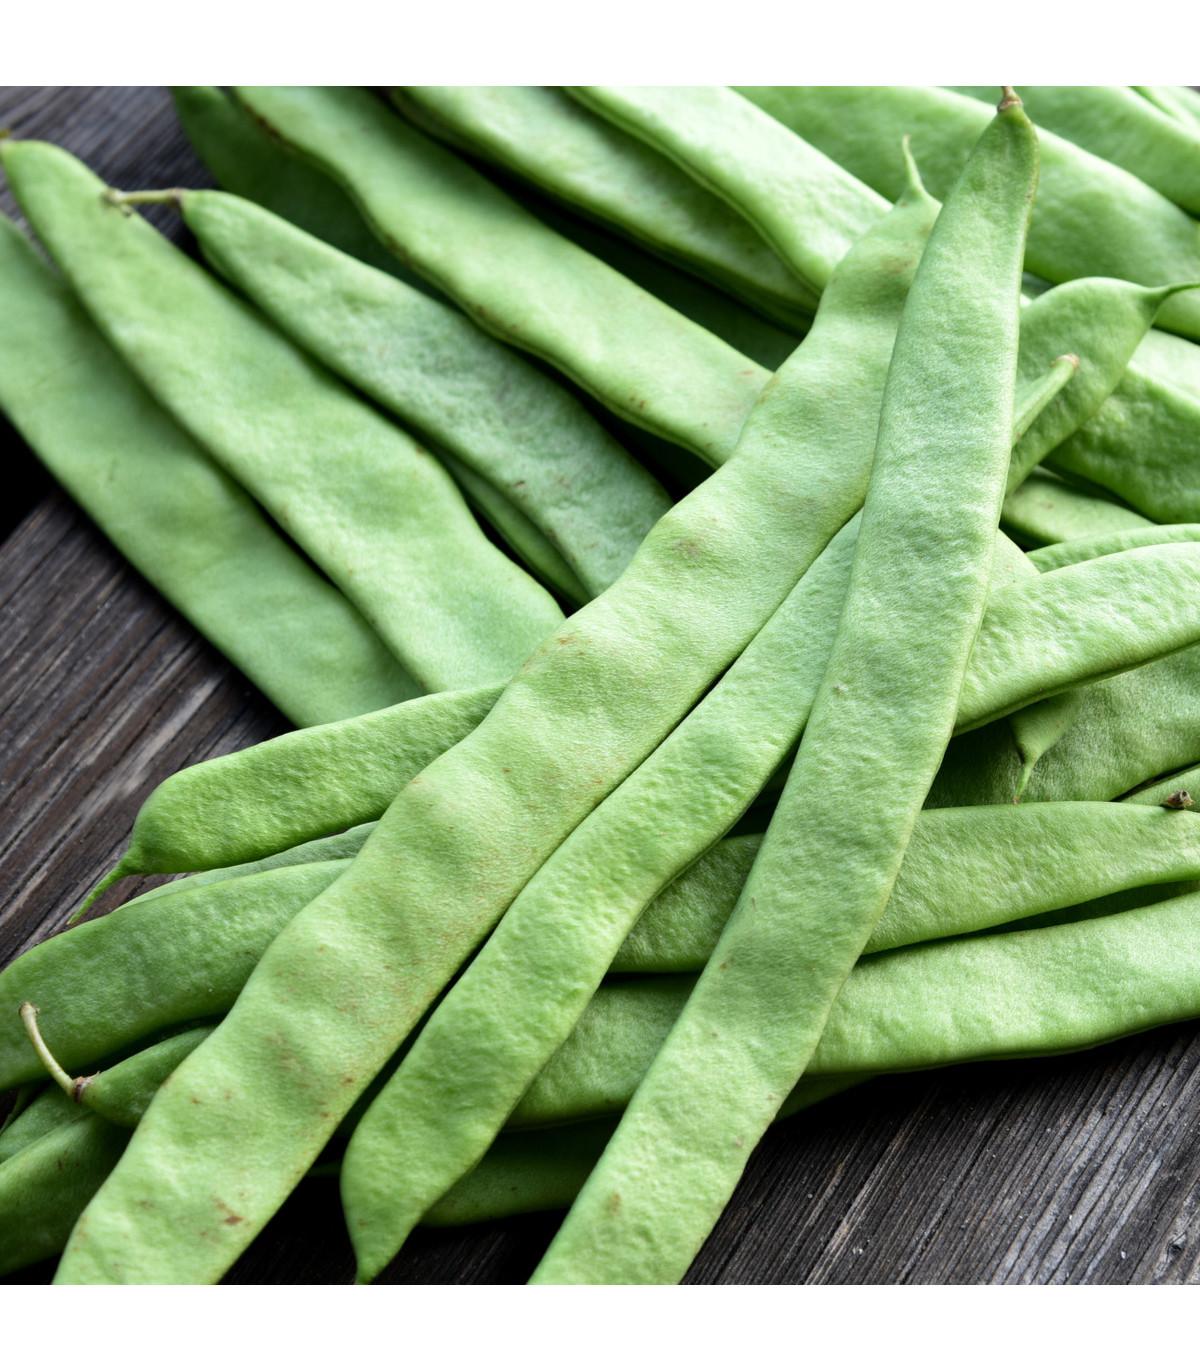 Fazol tyčkový Algarve - Phaseolus vulgaris  - prodej semen fazole - 8 ks